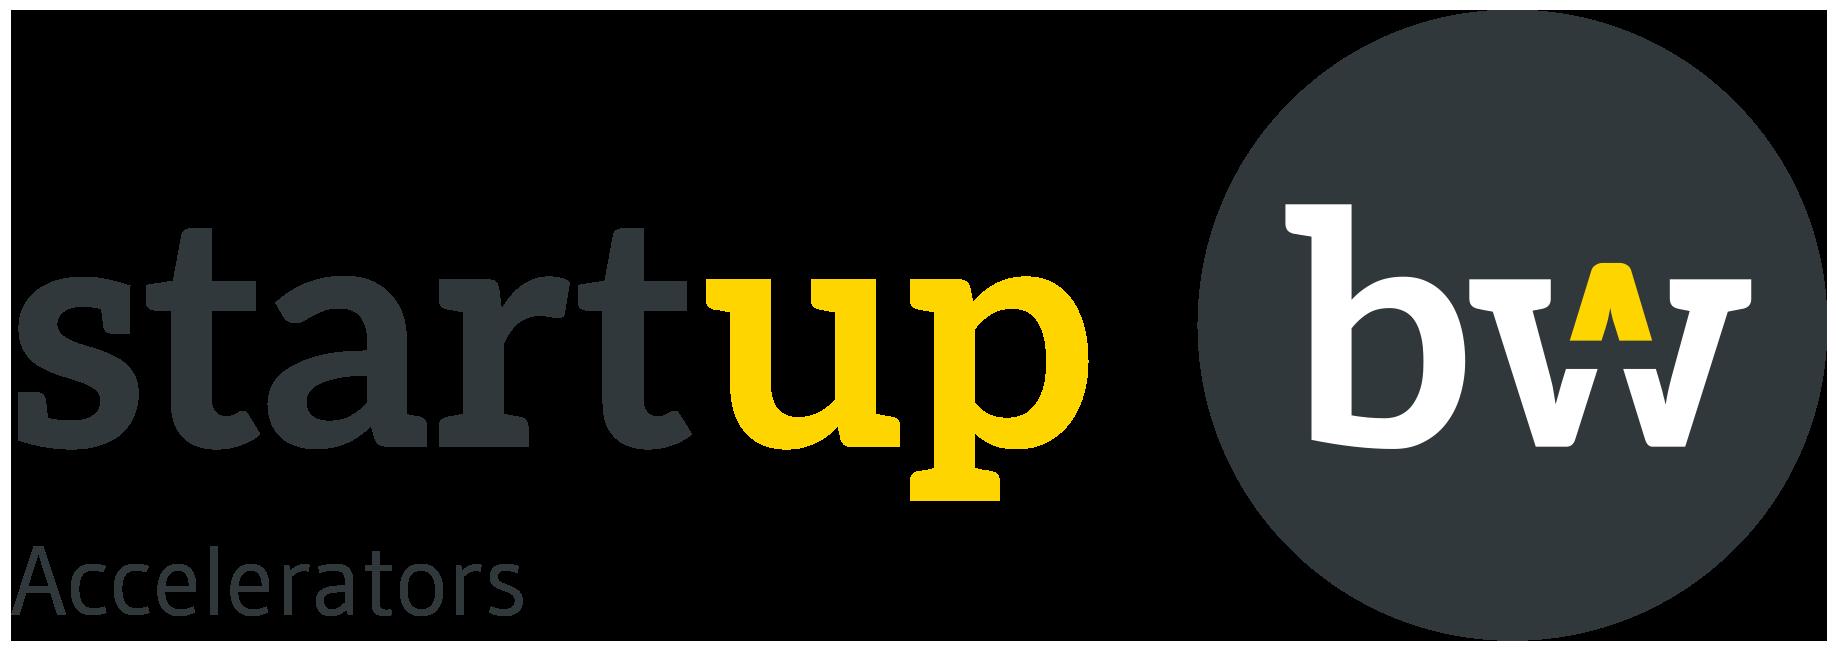 Start-Up-BW-Accelerator